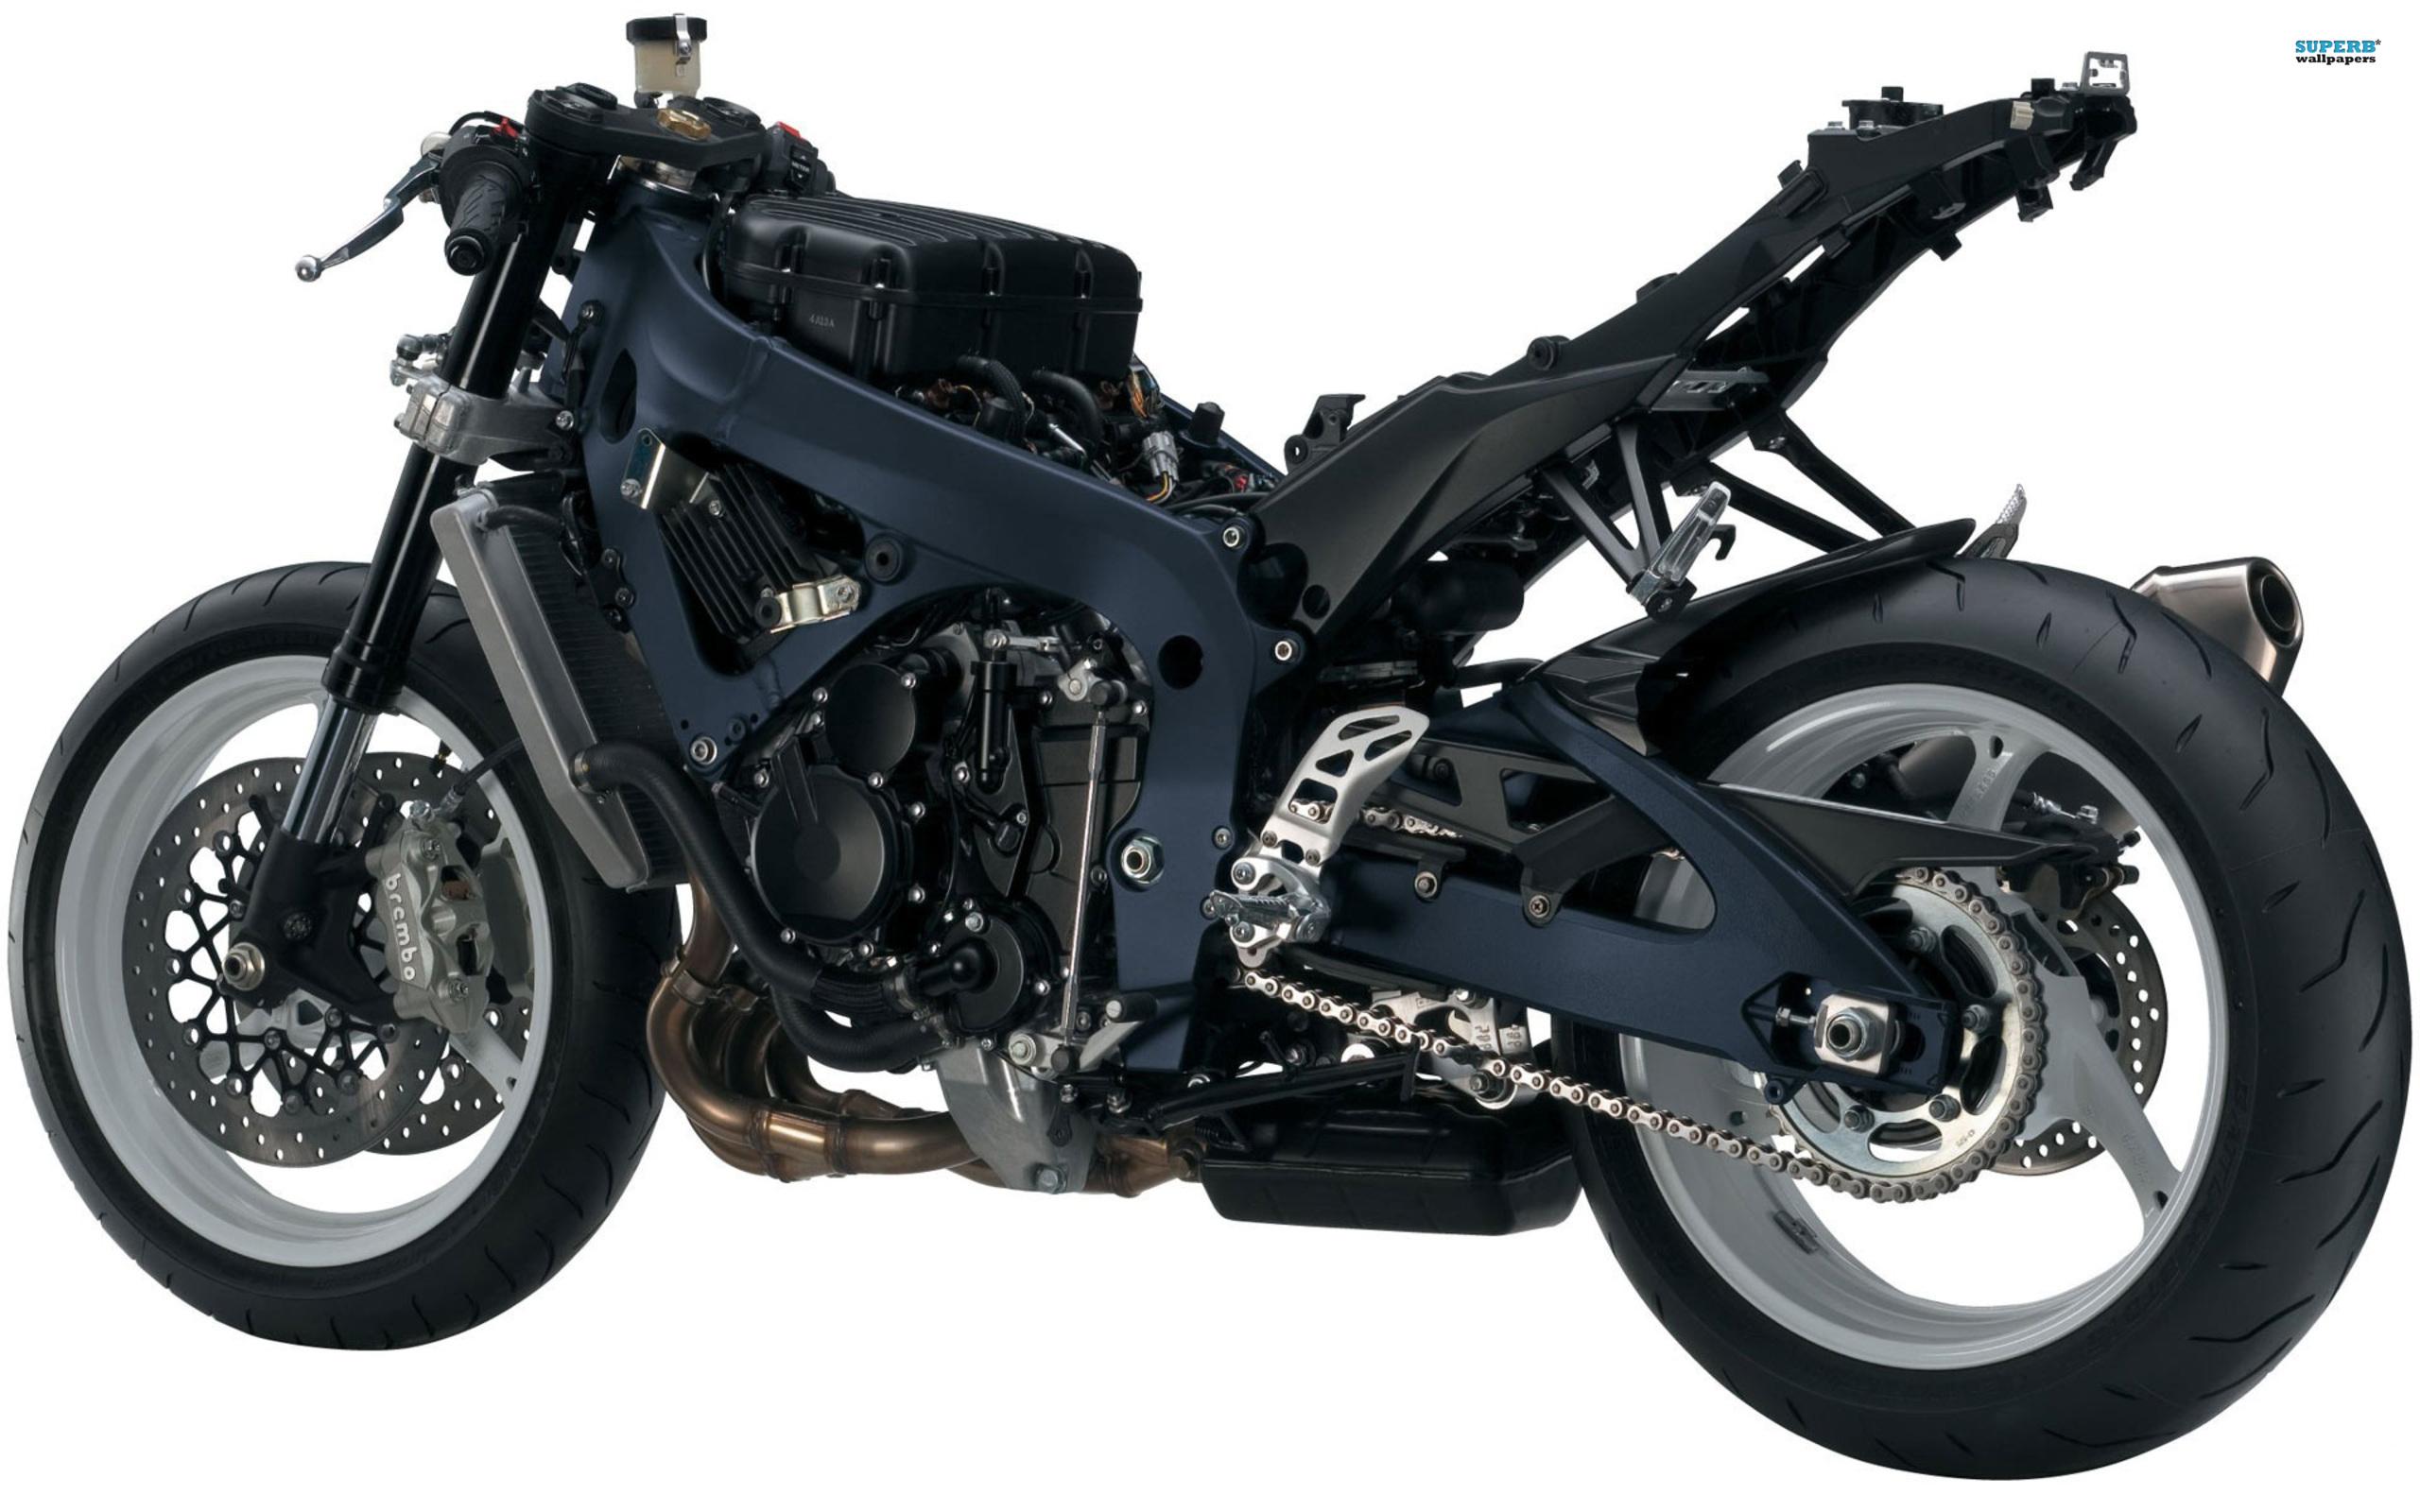 Motorcycles Suzuki Gsx R Motorcycle 674520 Wallpaper wallpaper